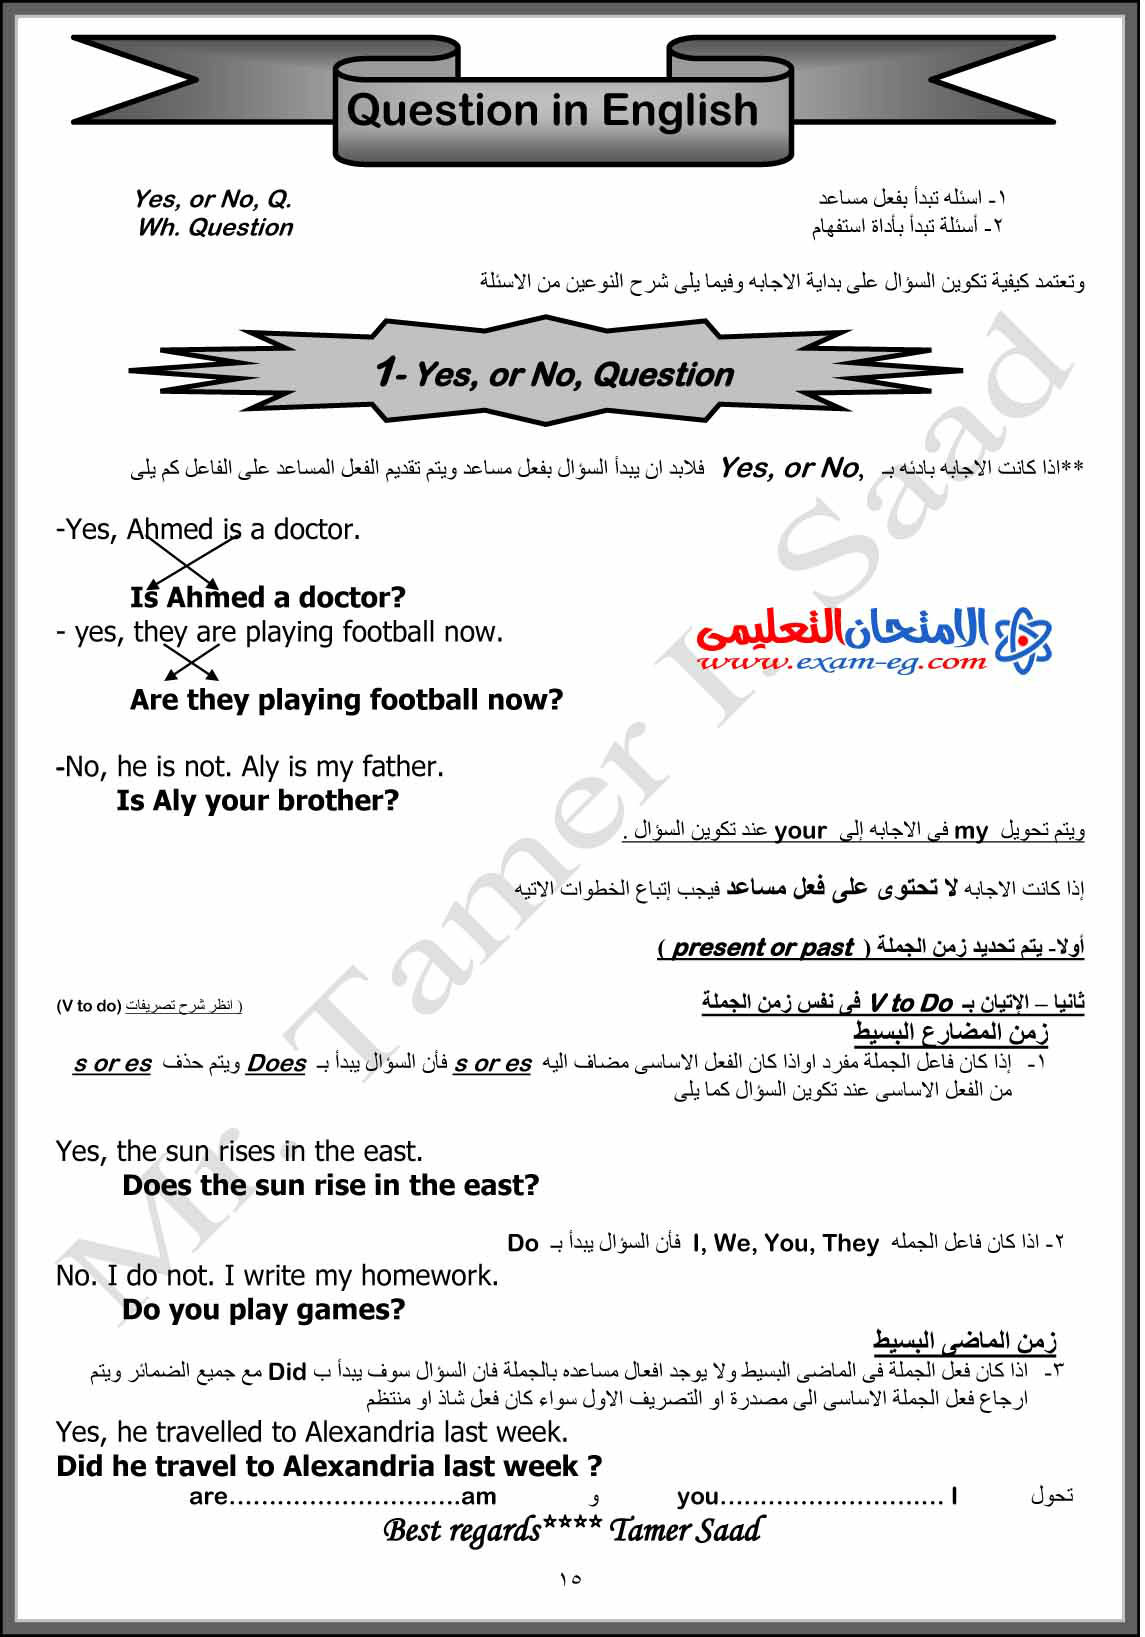 exam-eg.com_14428452404915.jpg